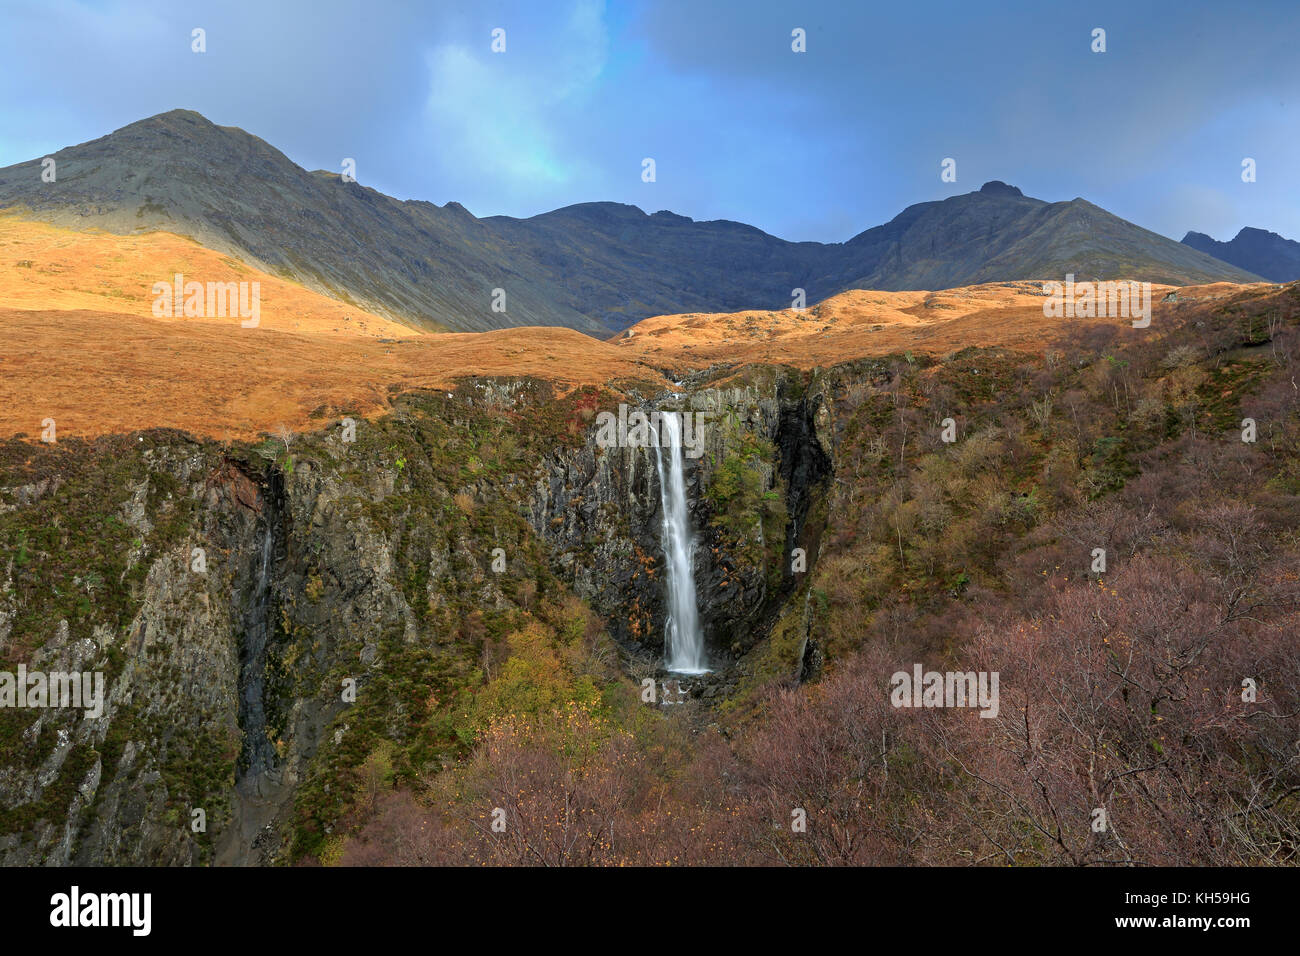 Eas More waterfall Isle of Skye - Stock Image